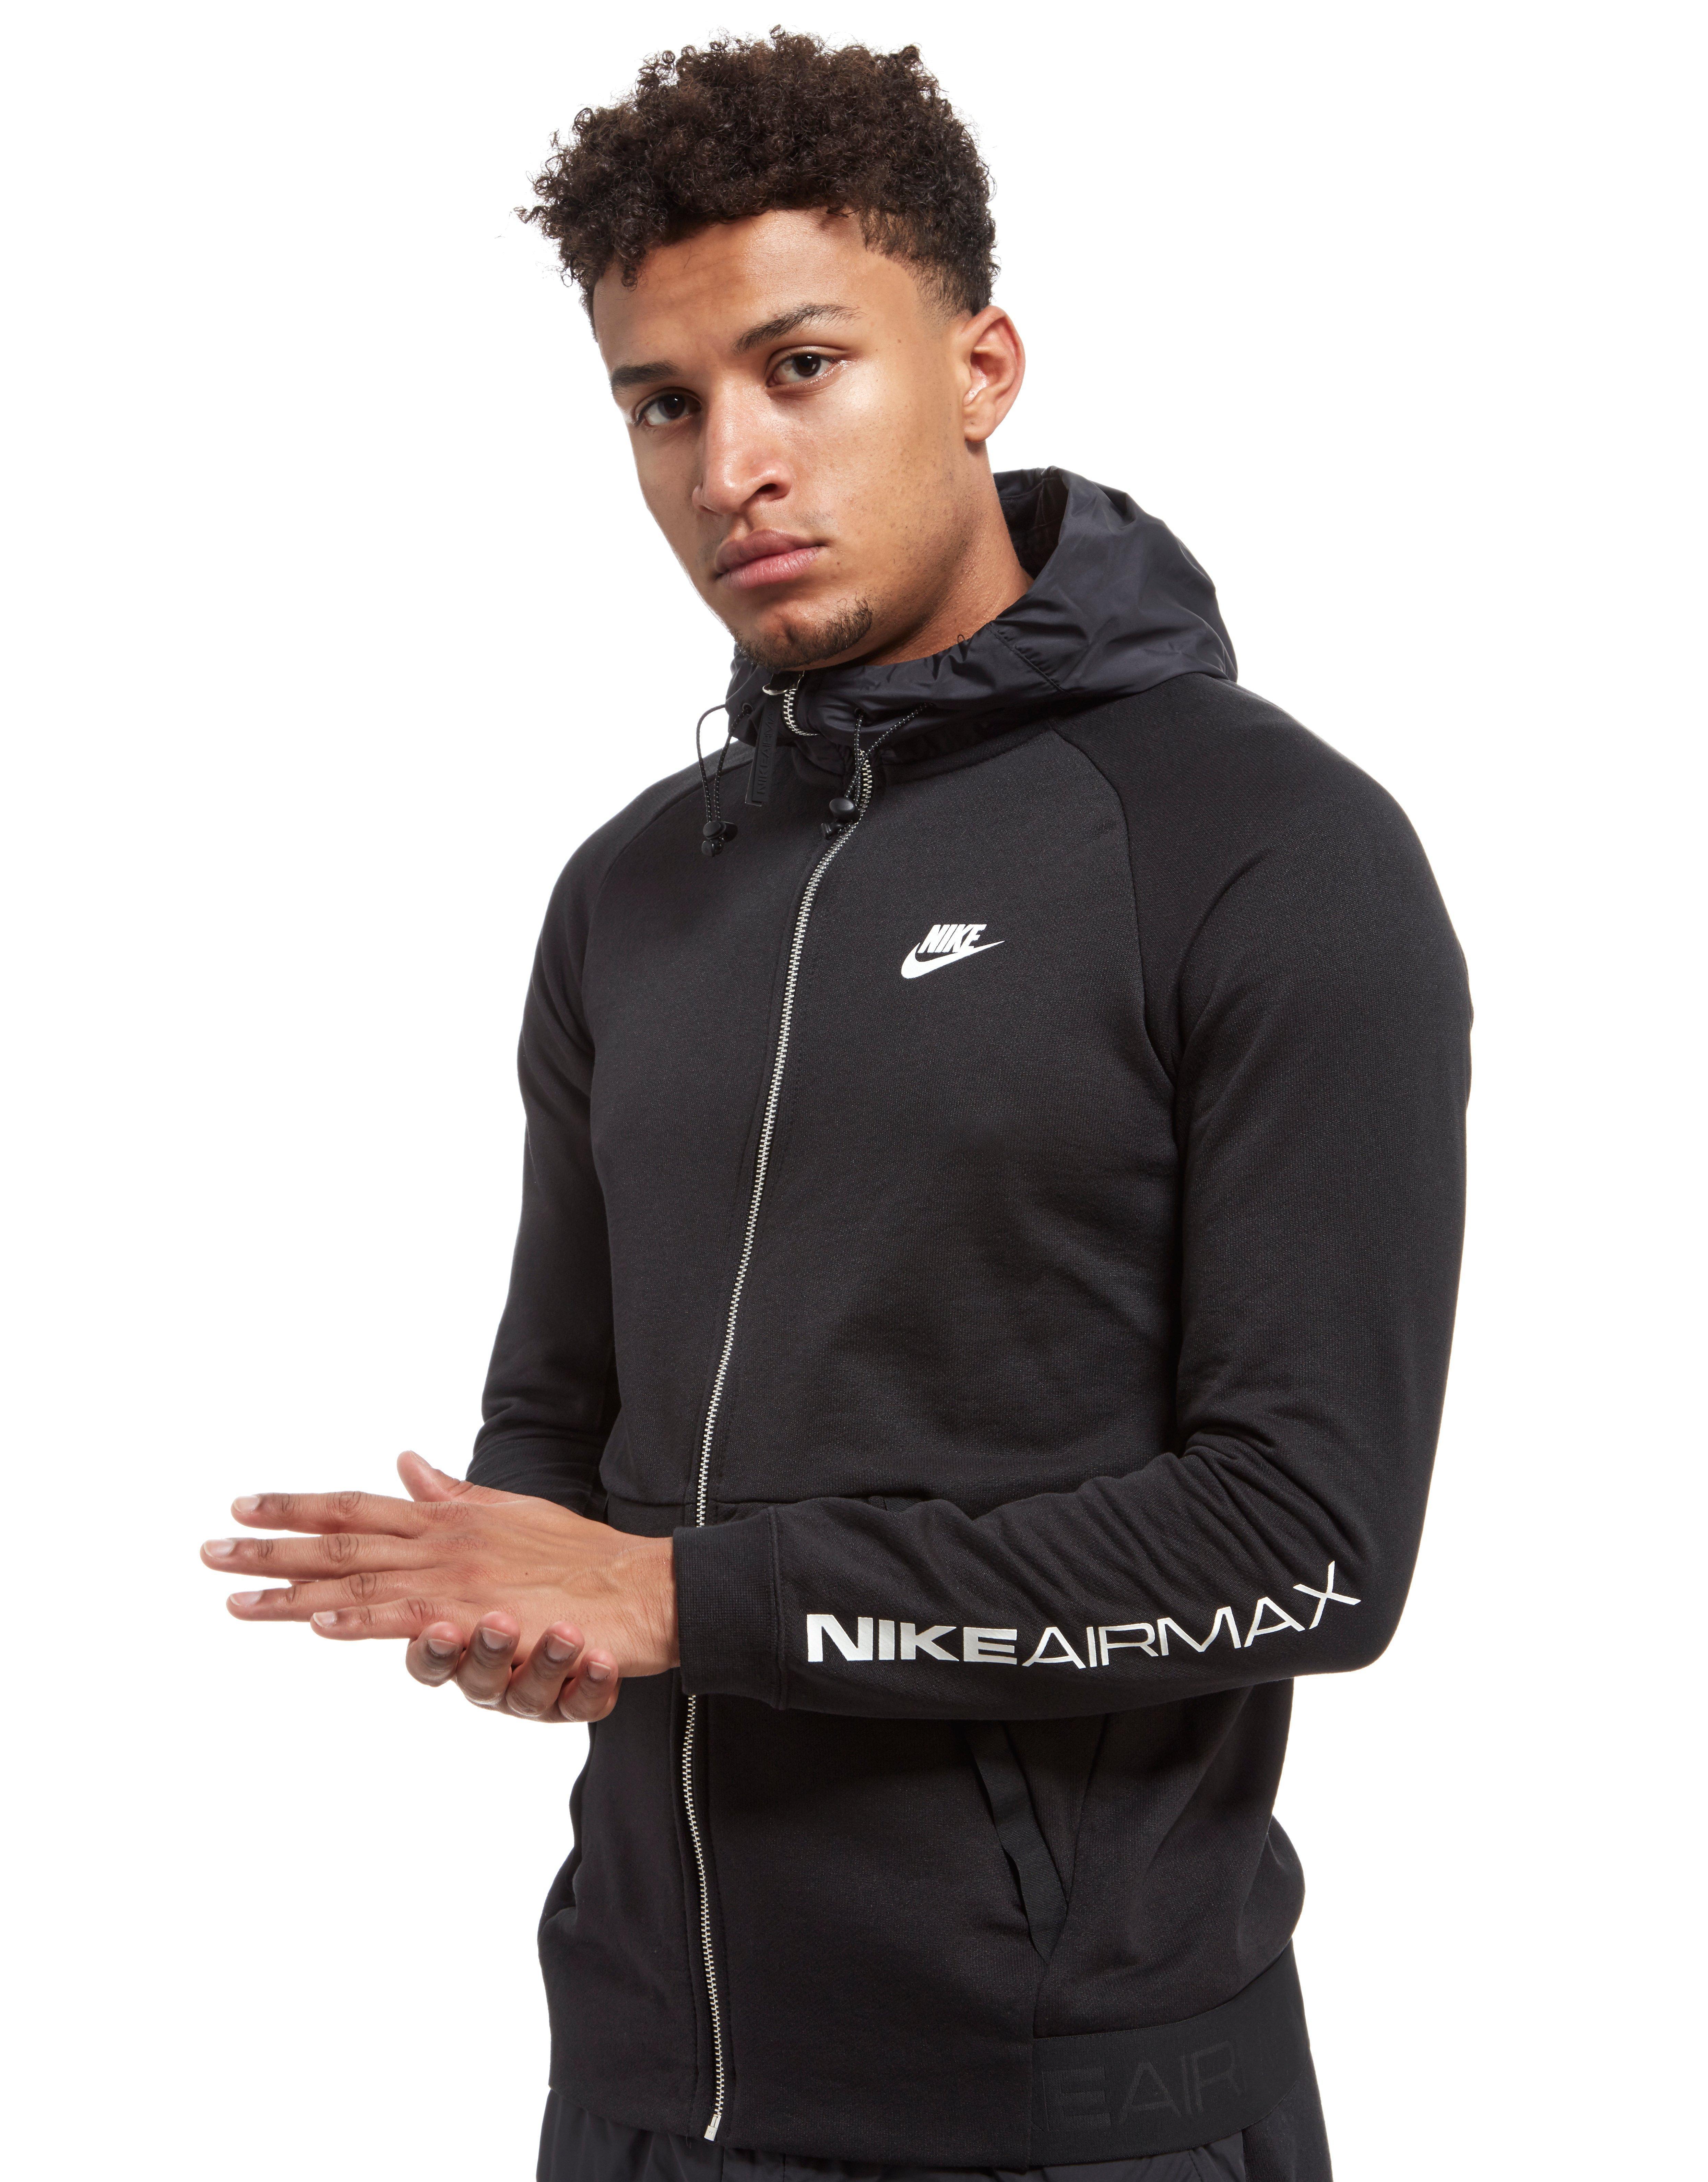 13ad28f2bffd Lyst - Nike Air Max Ft Full Zip Hoodie in Black for Men